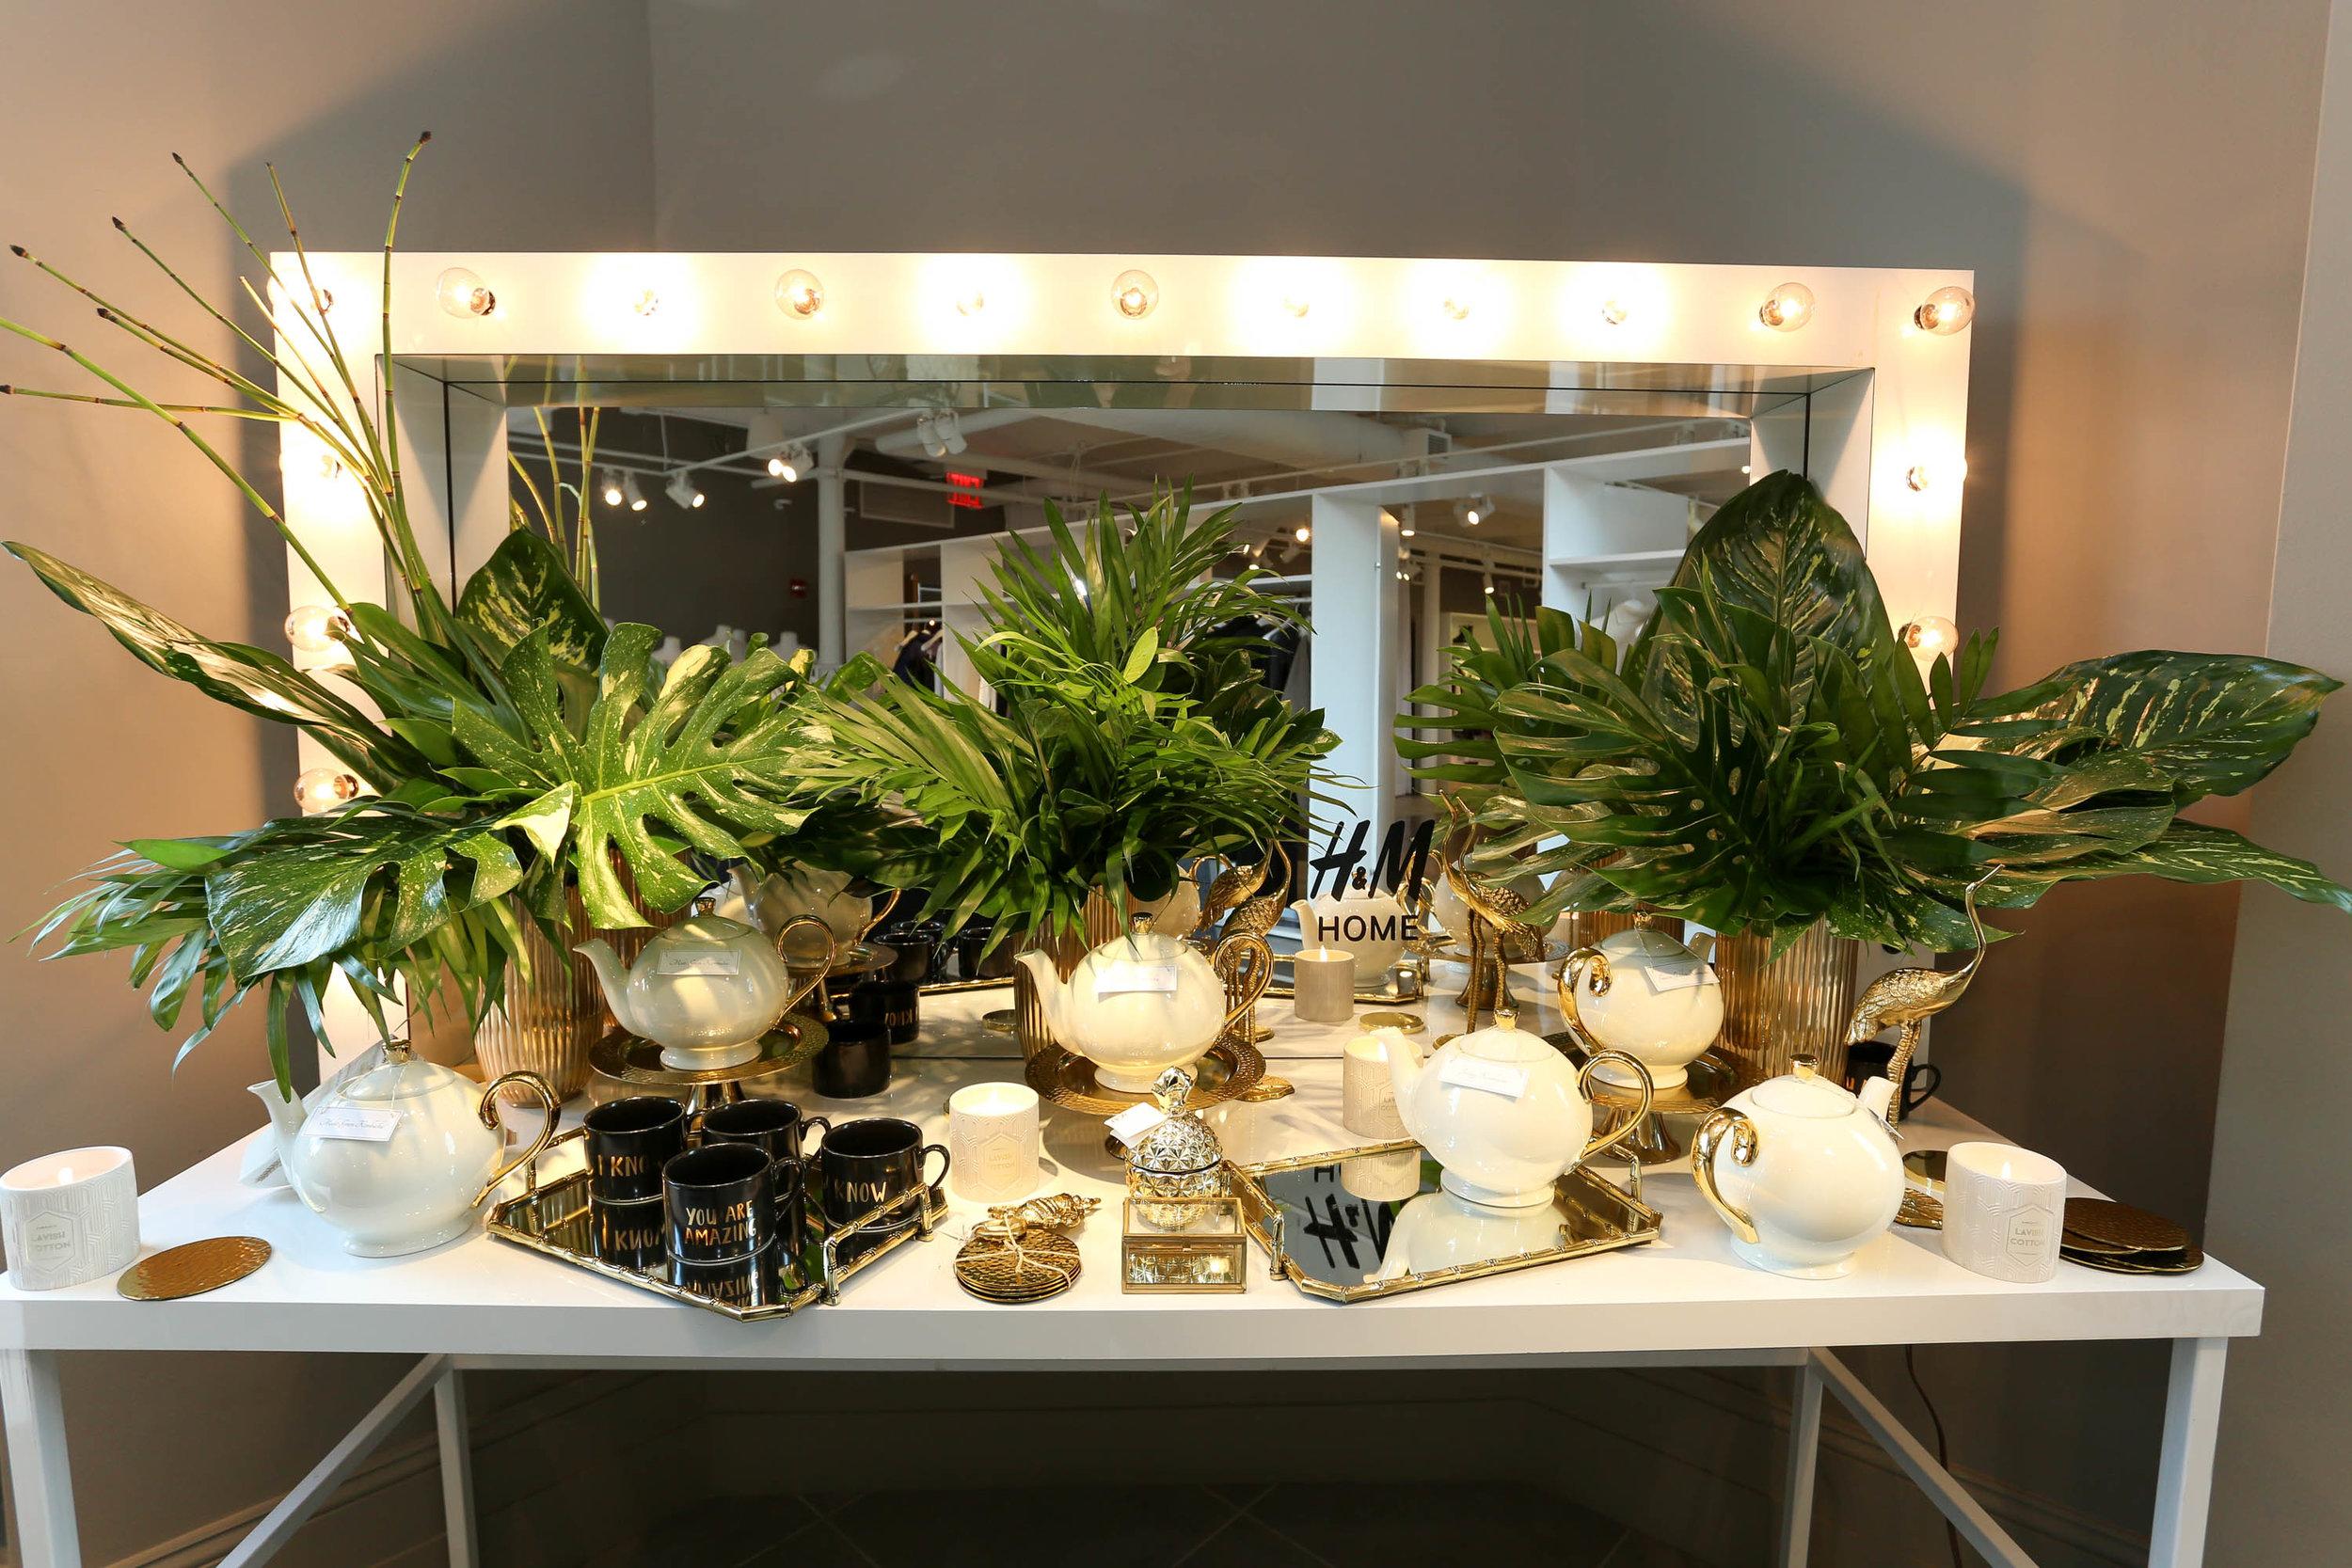 H&M vanity insallation